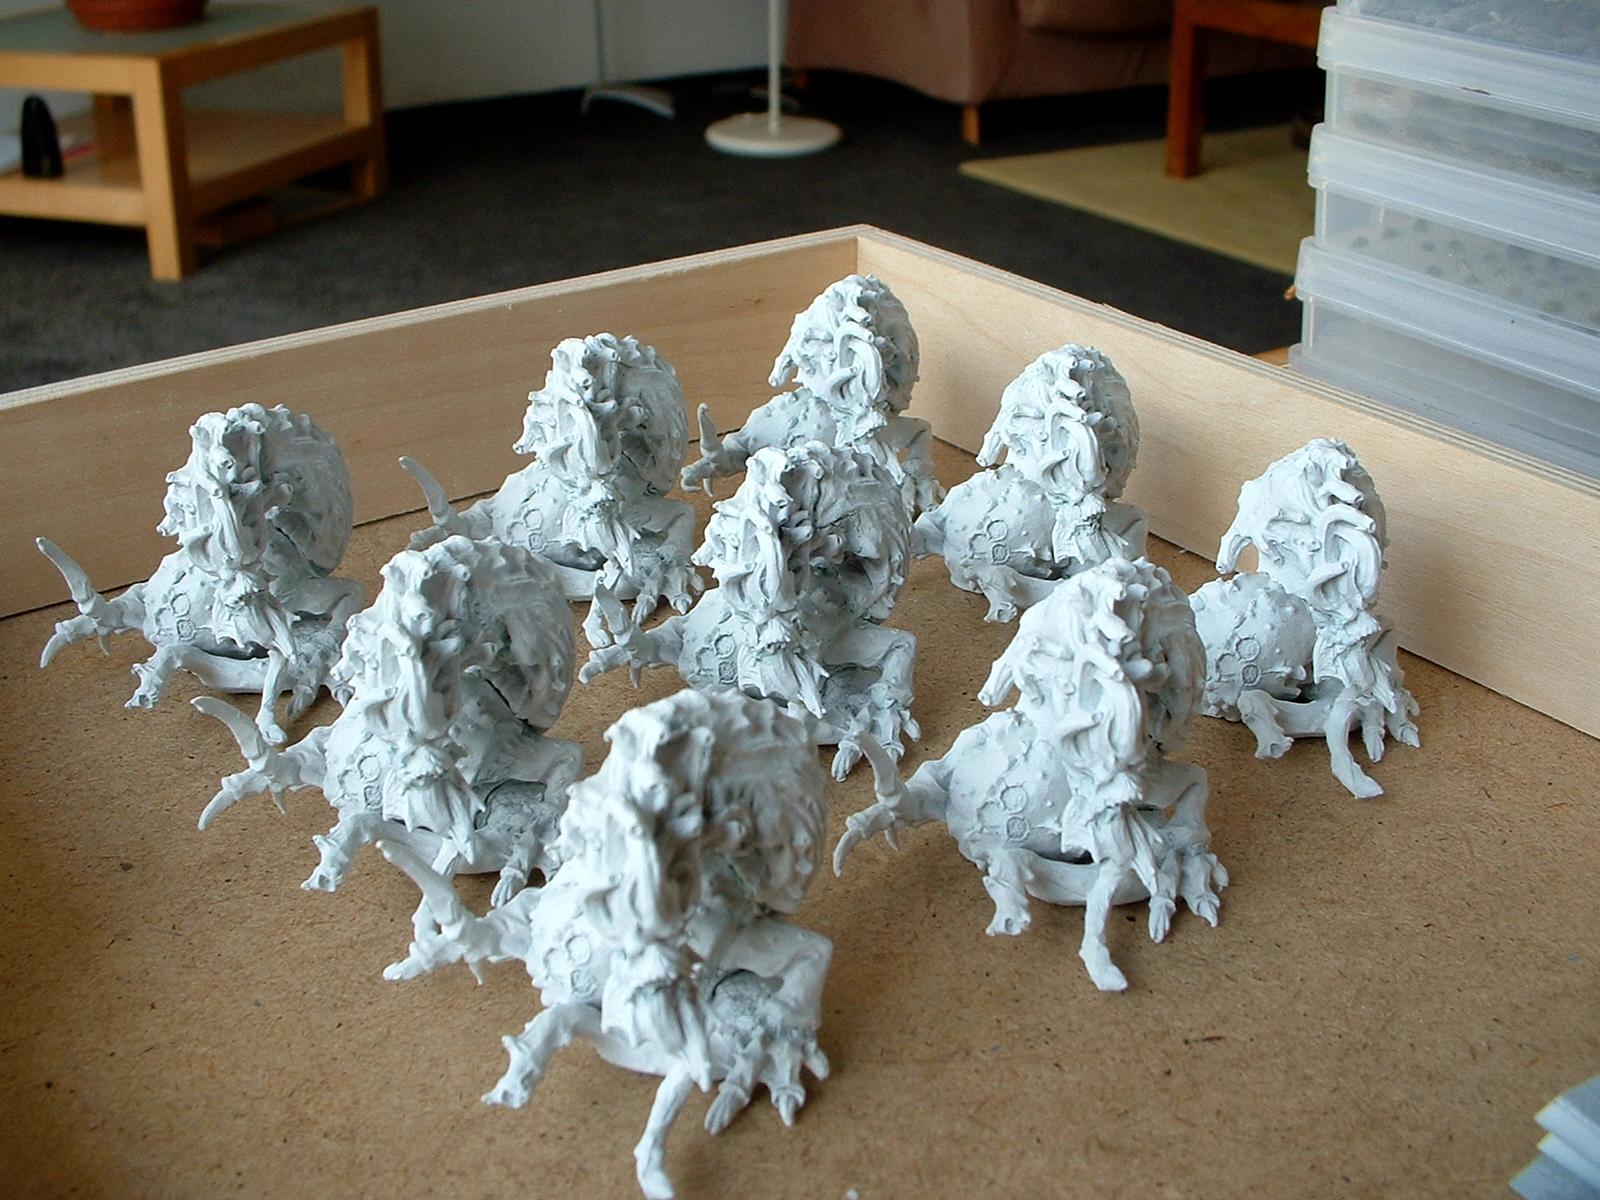 Beasts Of Nurgle, Chaos, Daemons, Nurgle, Primered, Work In Progress